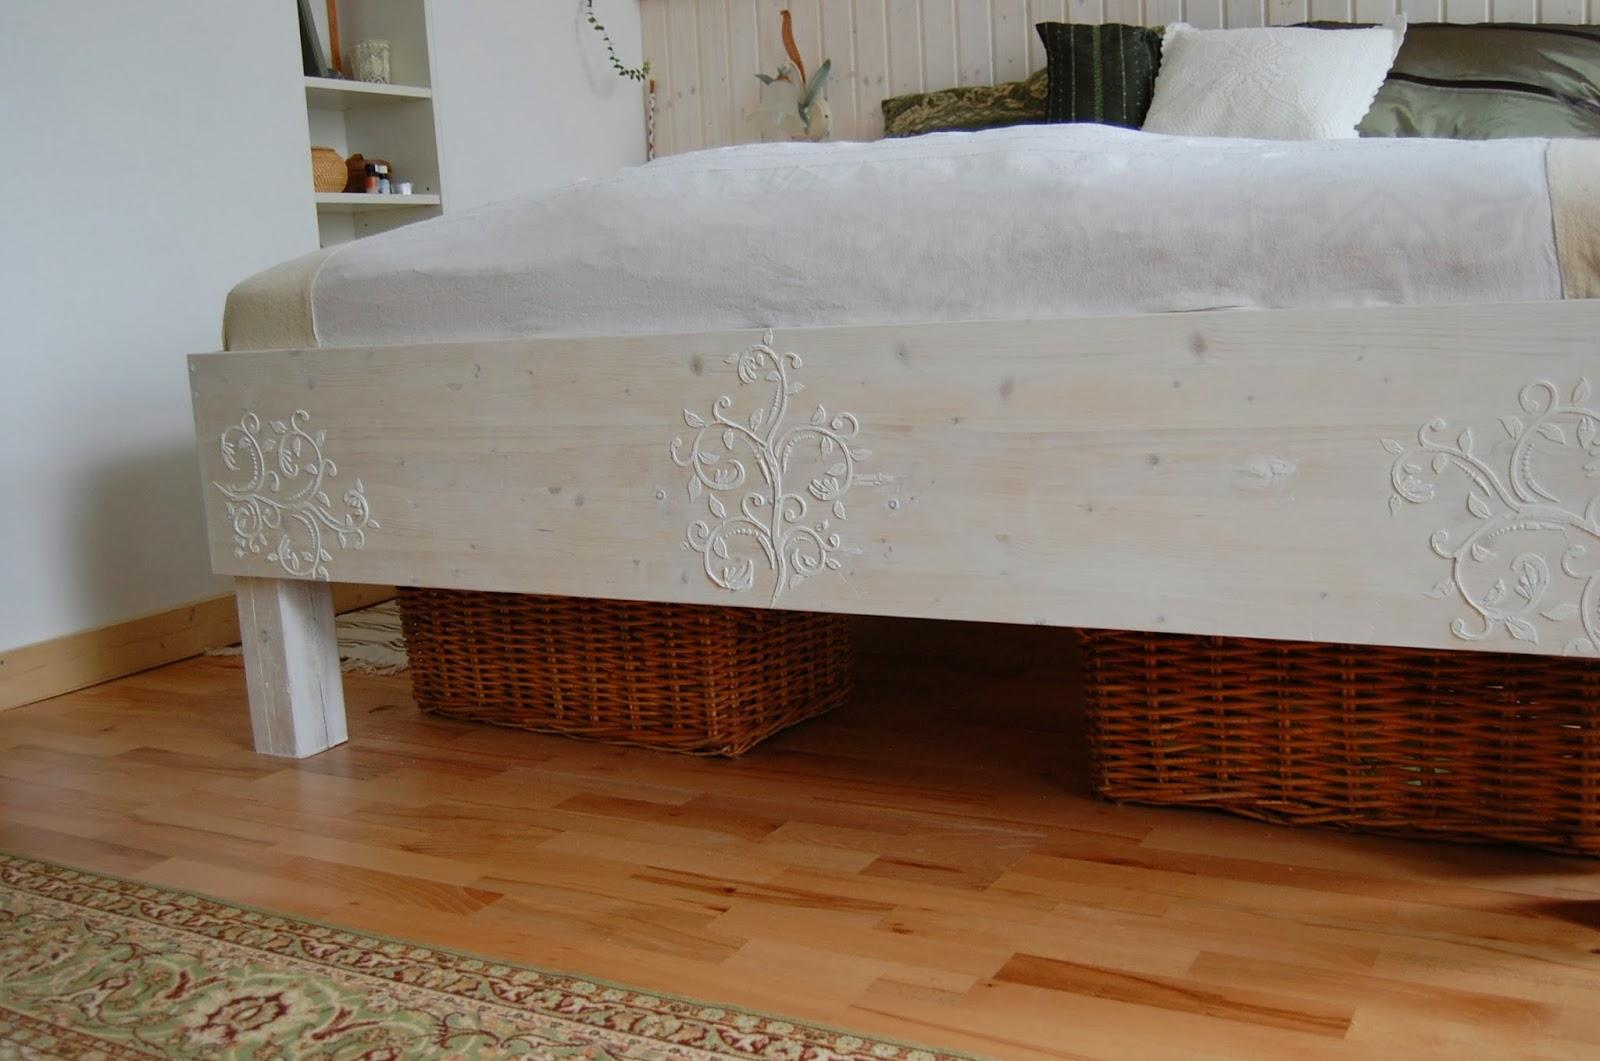 kunstvoll leben ideenwelt live 1 das bett. Black Bedroom Furniture Sets. Home Design Ideas